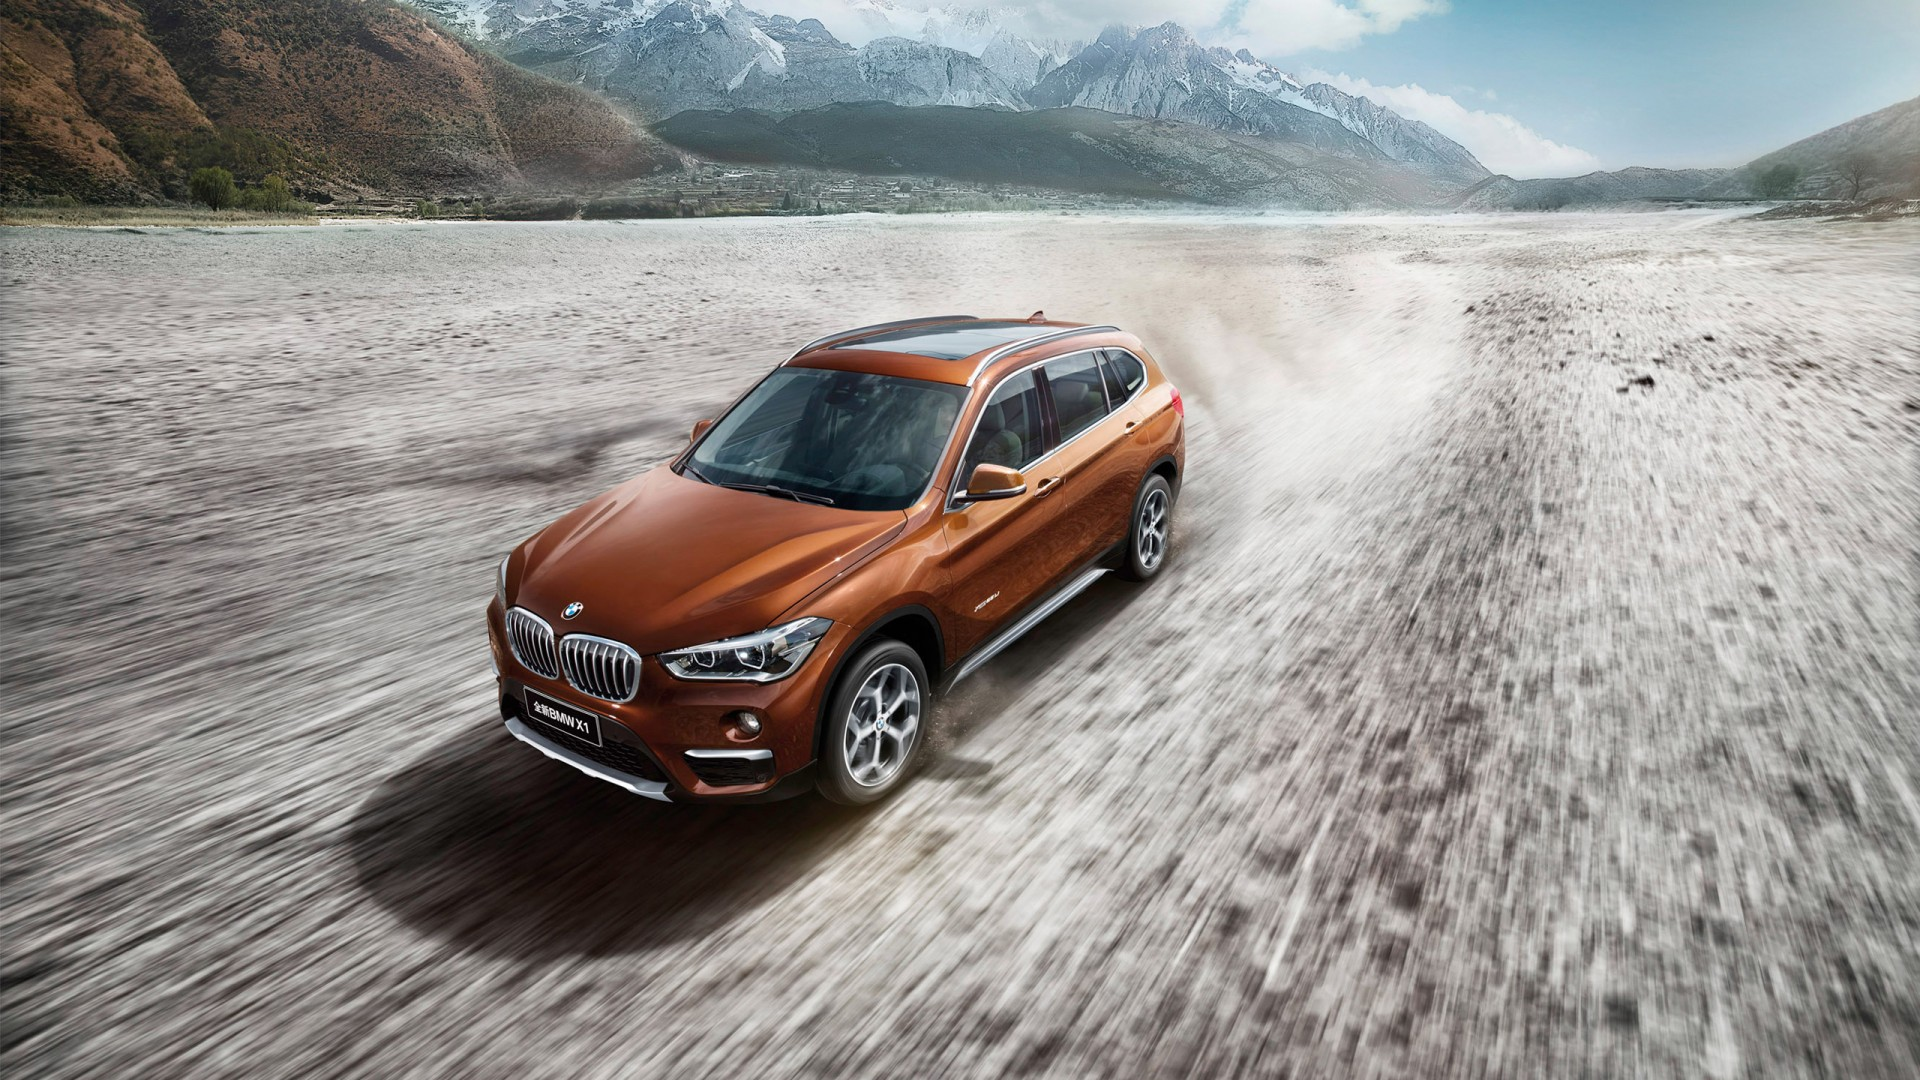 2016 BMW X1 Long Wheelbase 2 Wallpaper | HD Car Wallpapers ...